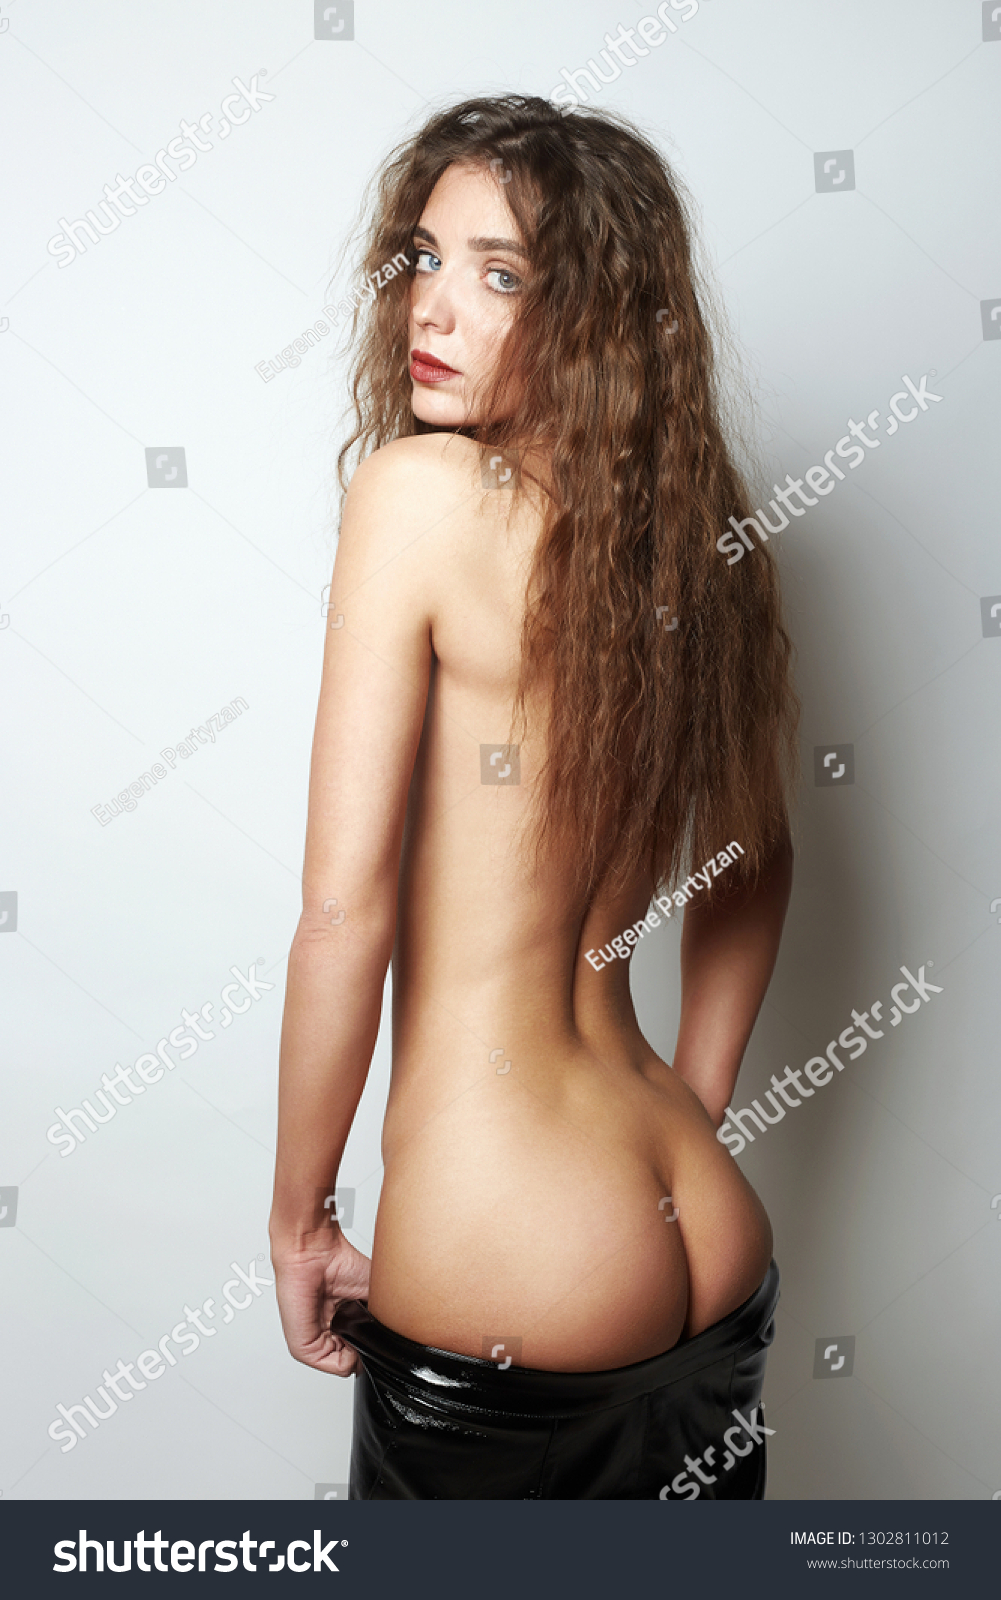 Beautiful girl naked Pics of